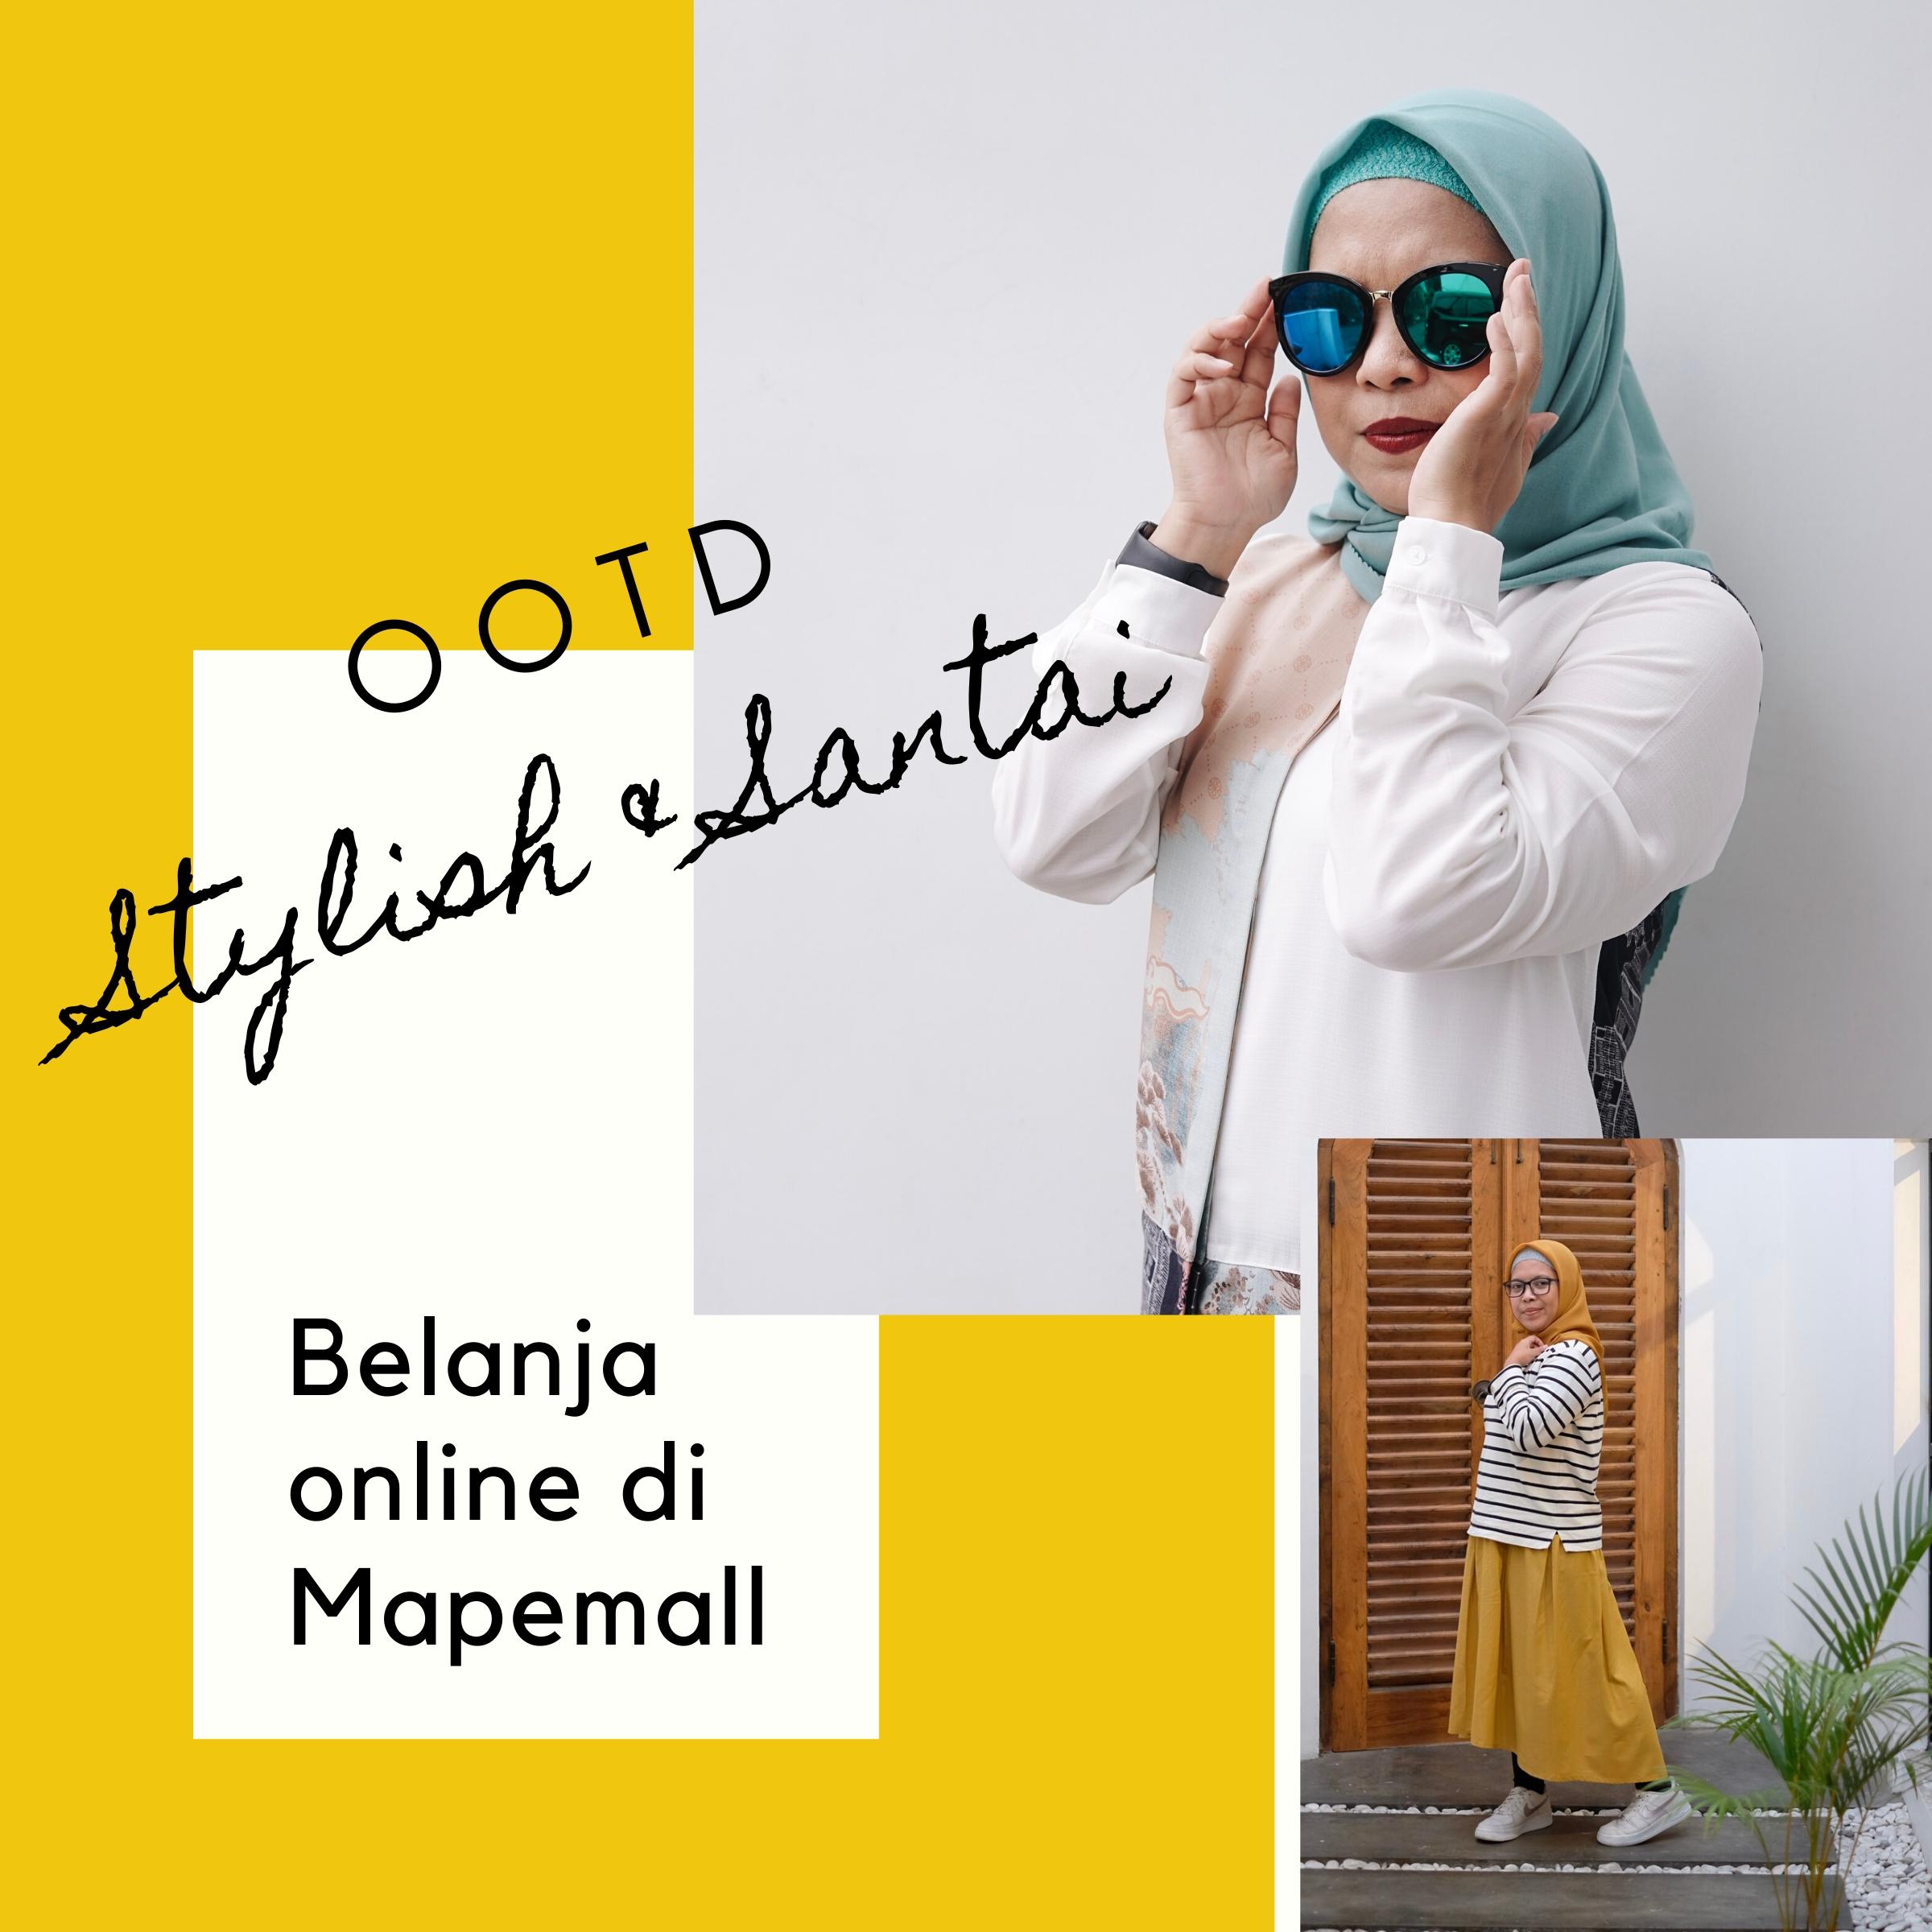 belanja online barang original di mapemall